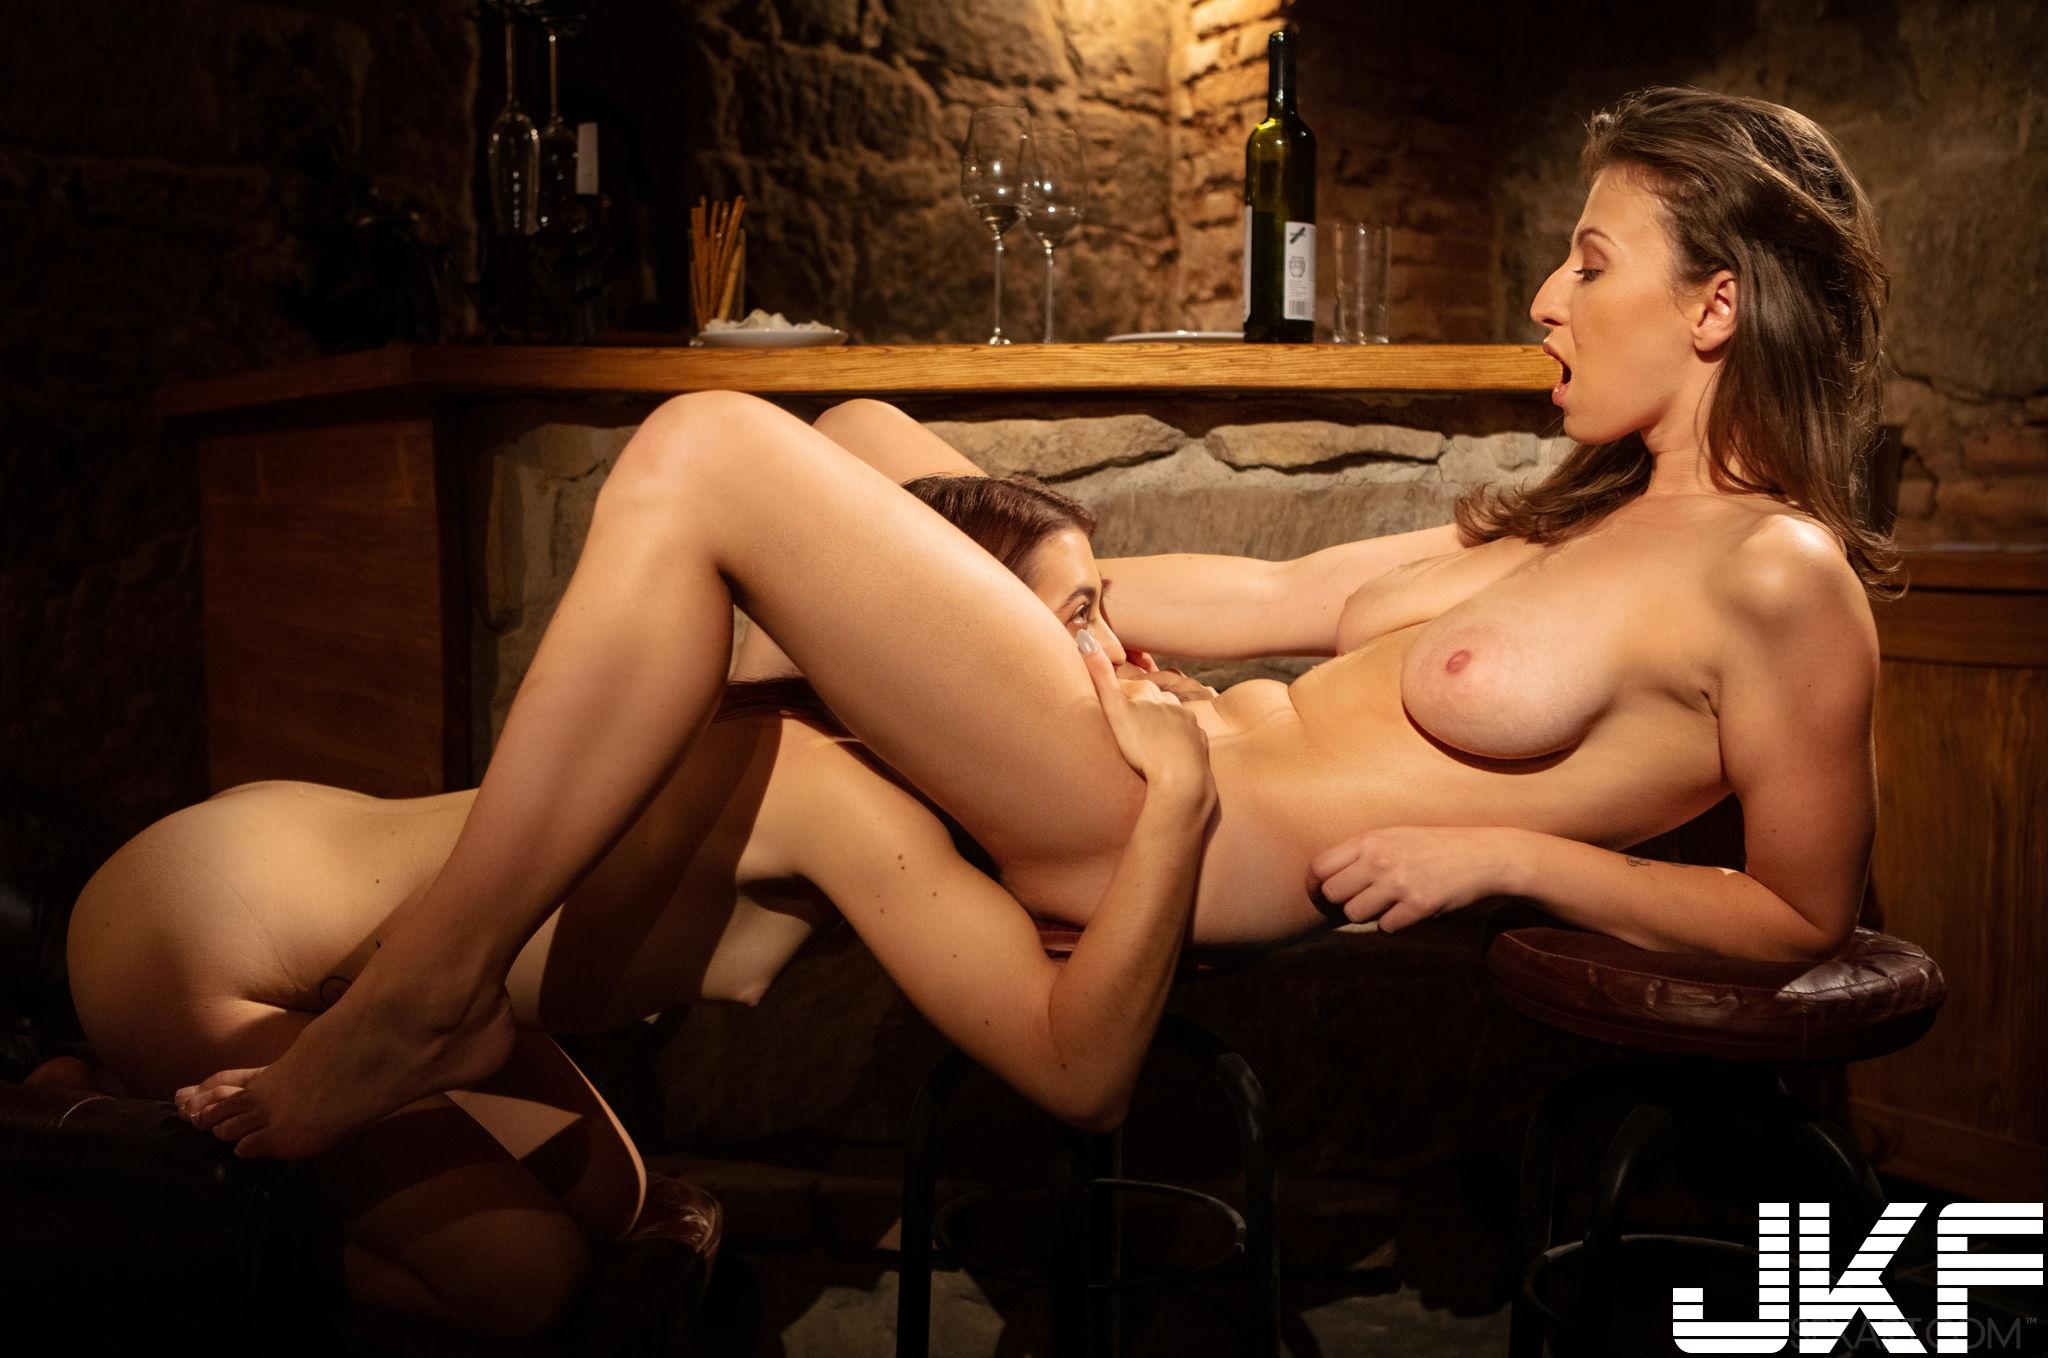 SexArt_Hangover-Part-1_Emylia-Argan--Tera-Link_medium_0053.jpg